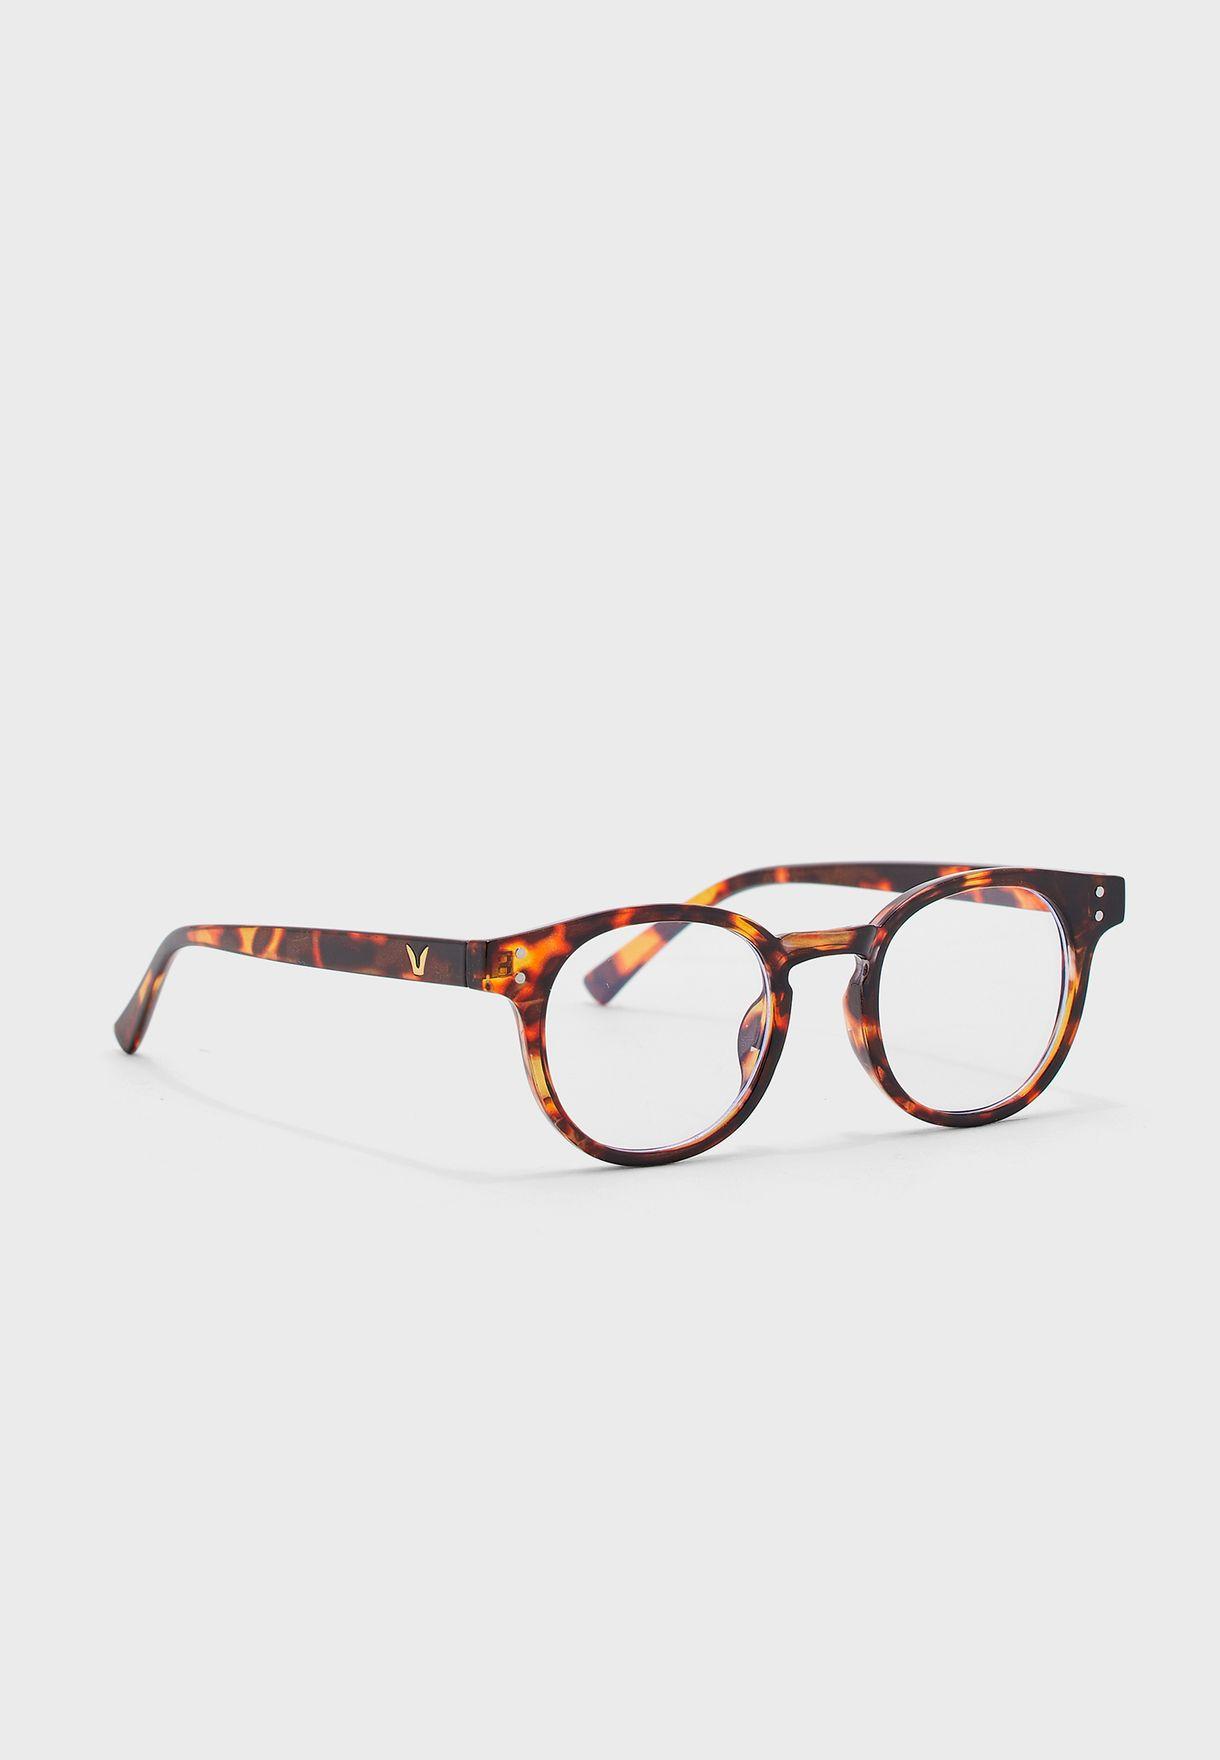 Tort Clear Lens Glasses